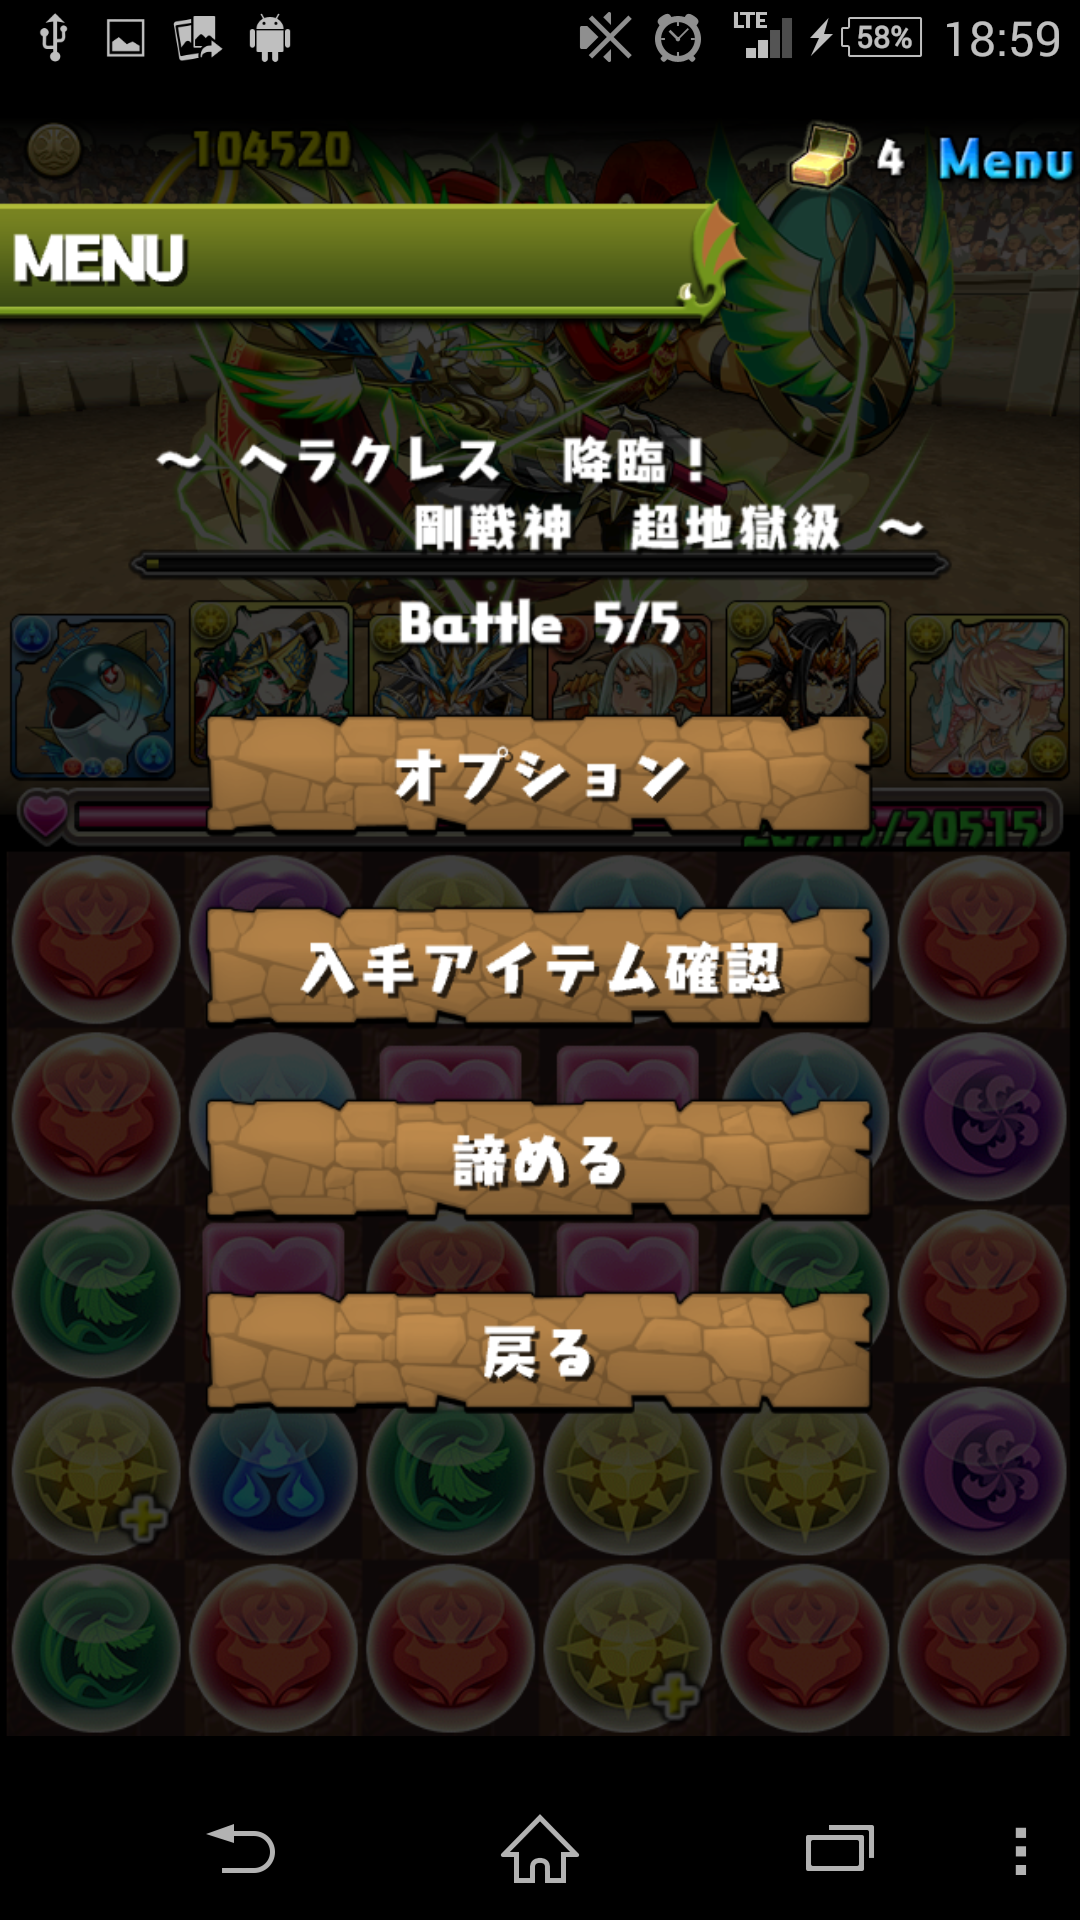 Screenshot_2014-09-09-18-59-33.png